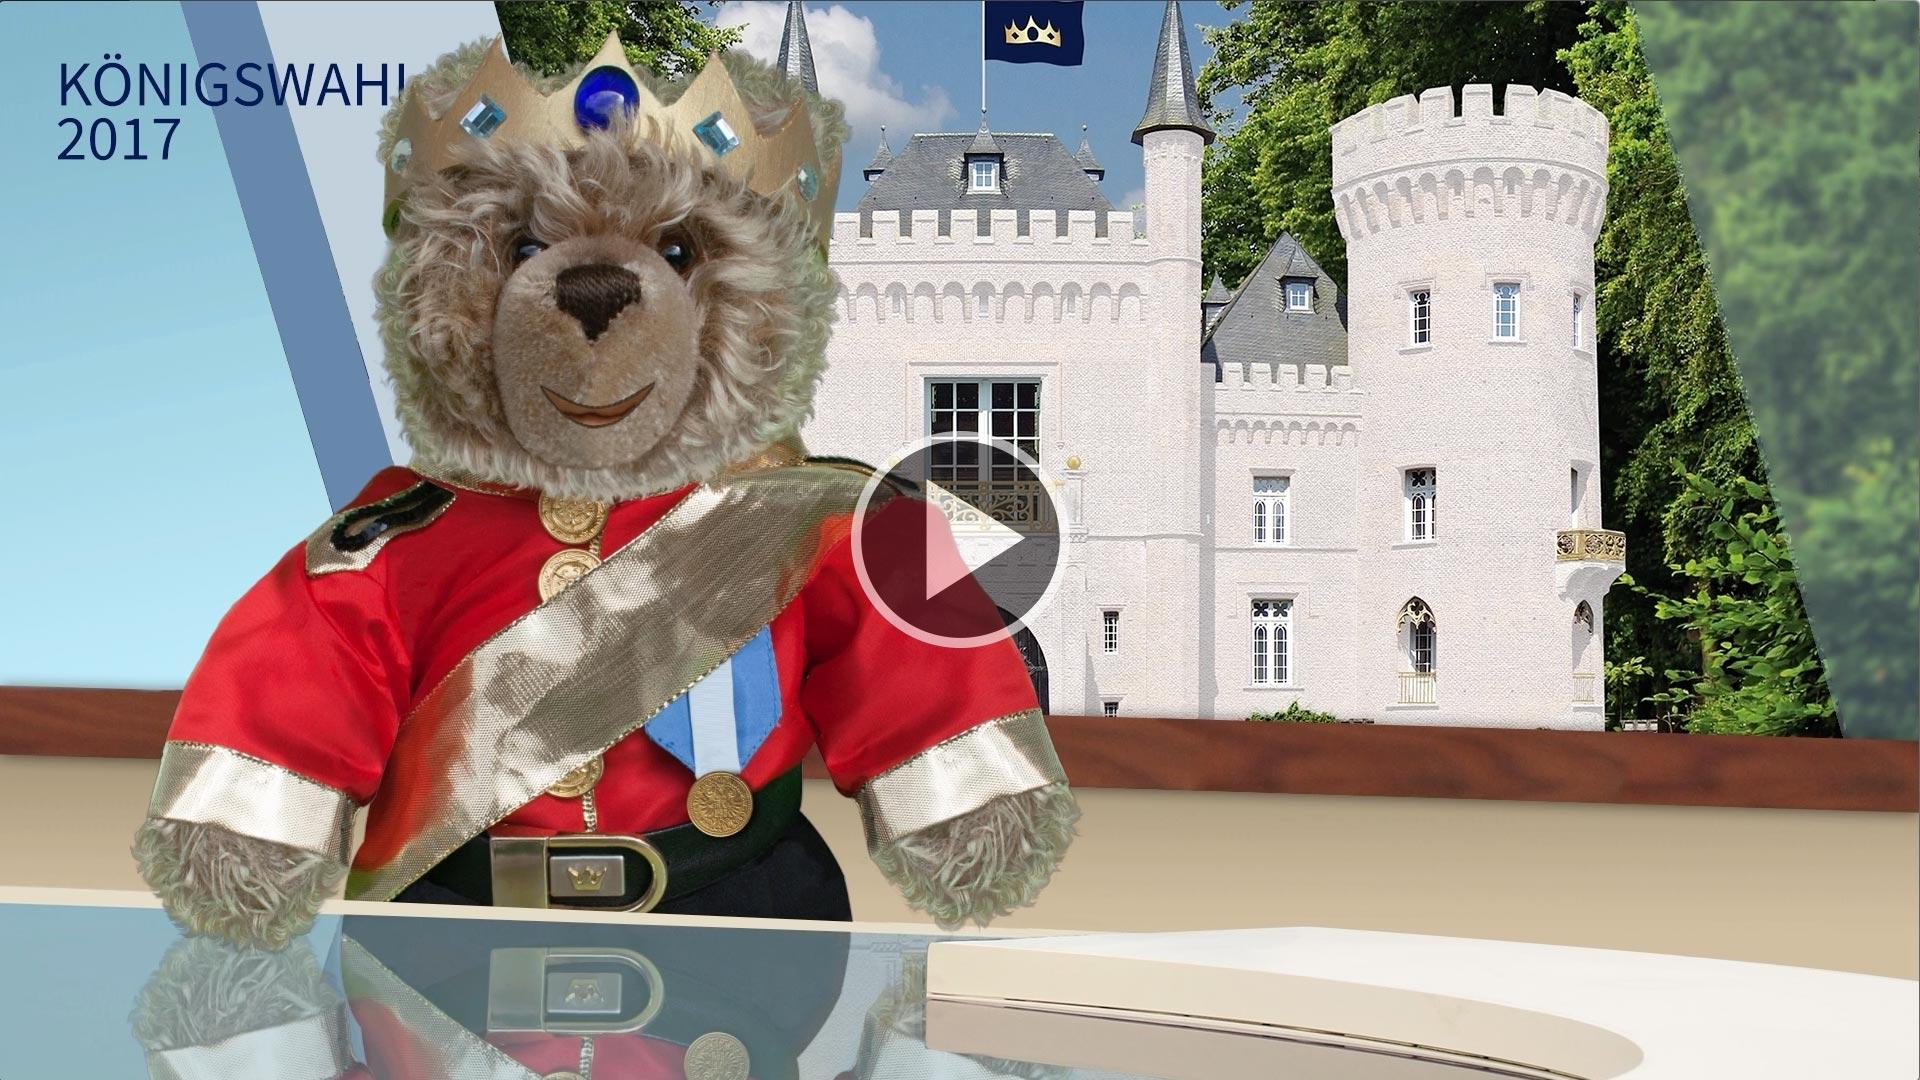 Teddybär-König Opa zur Wahl 2017